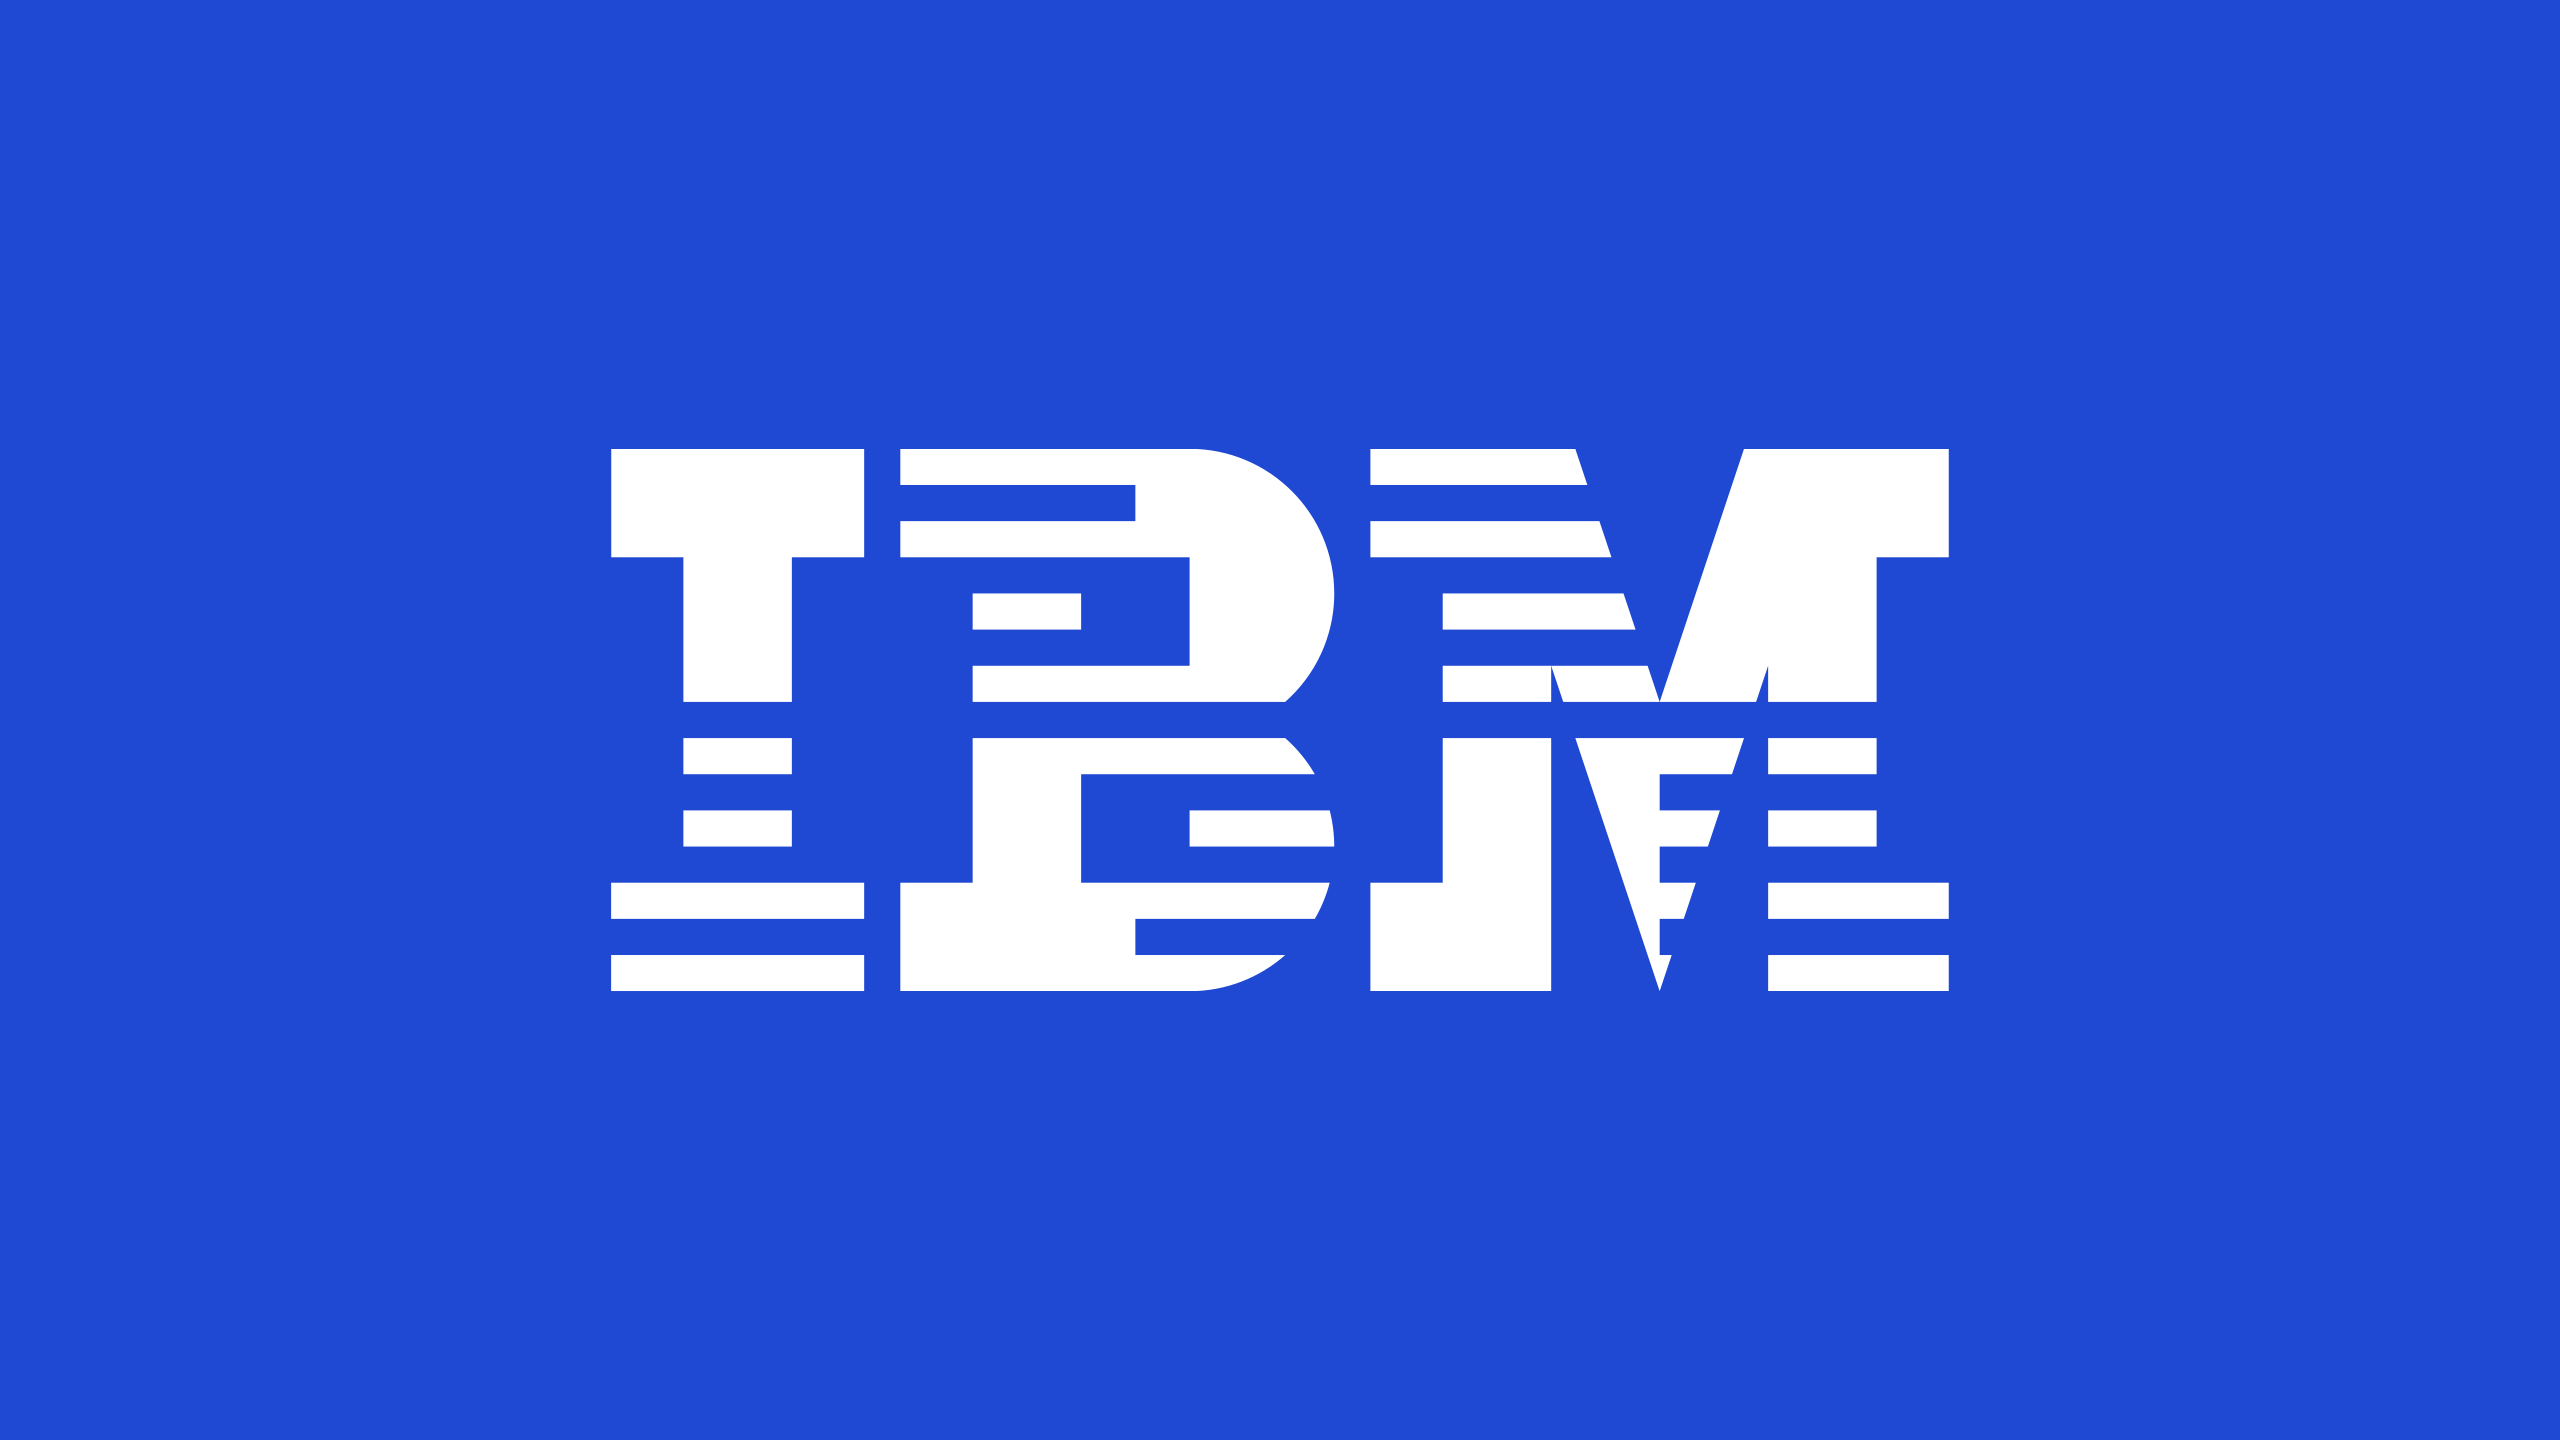 IBM → 4x4